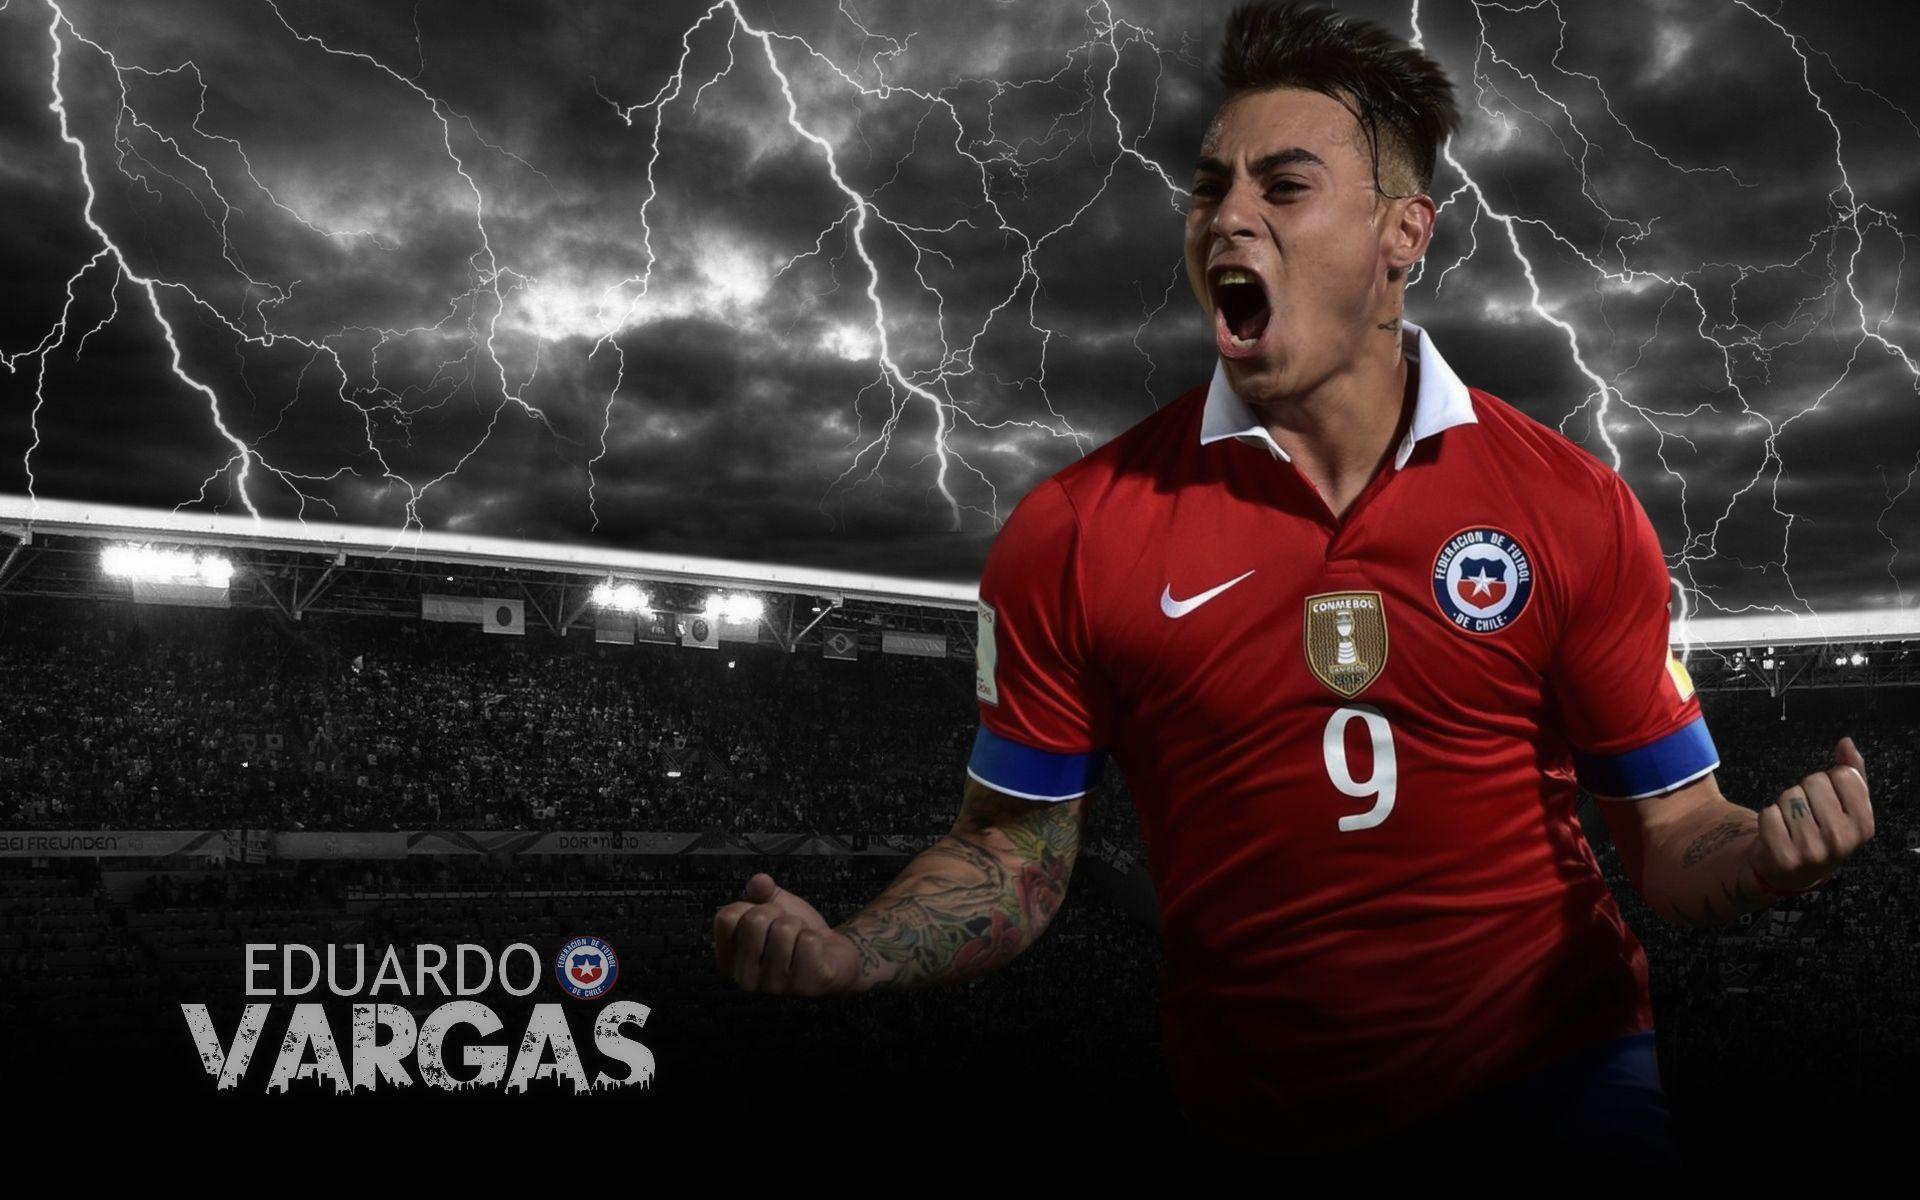 Eduardo Vargas Wallpaper 2015-16 (CHILE) By ChrisRamos4 On